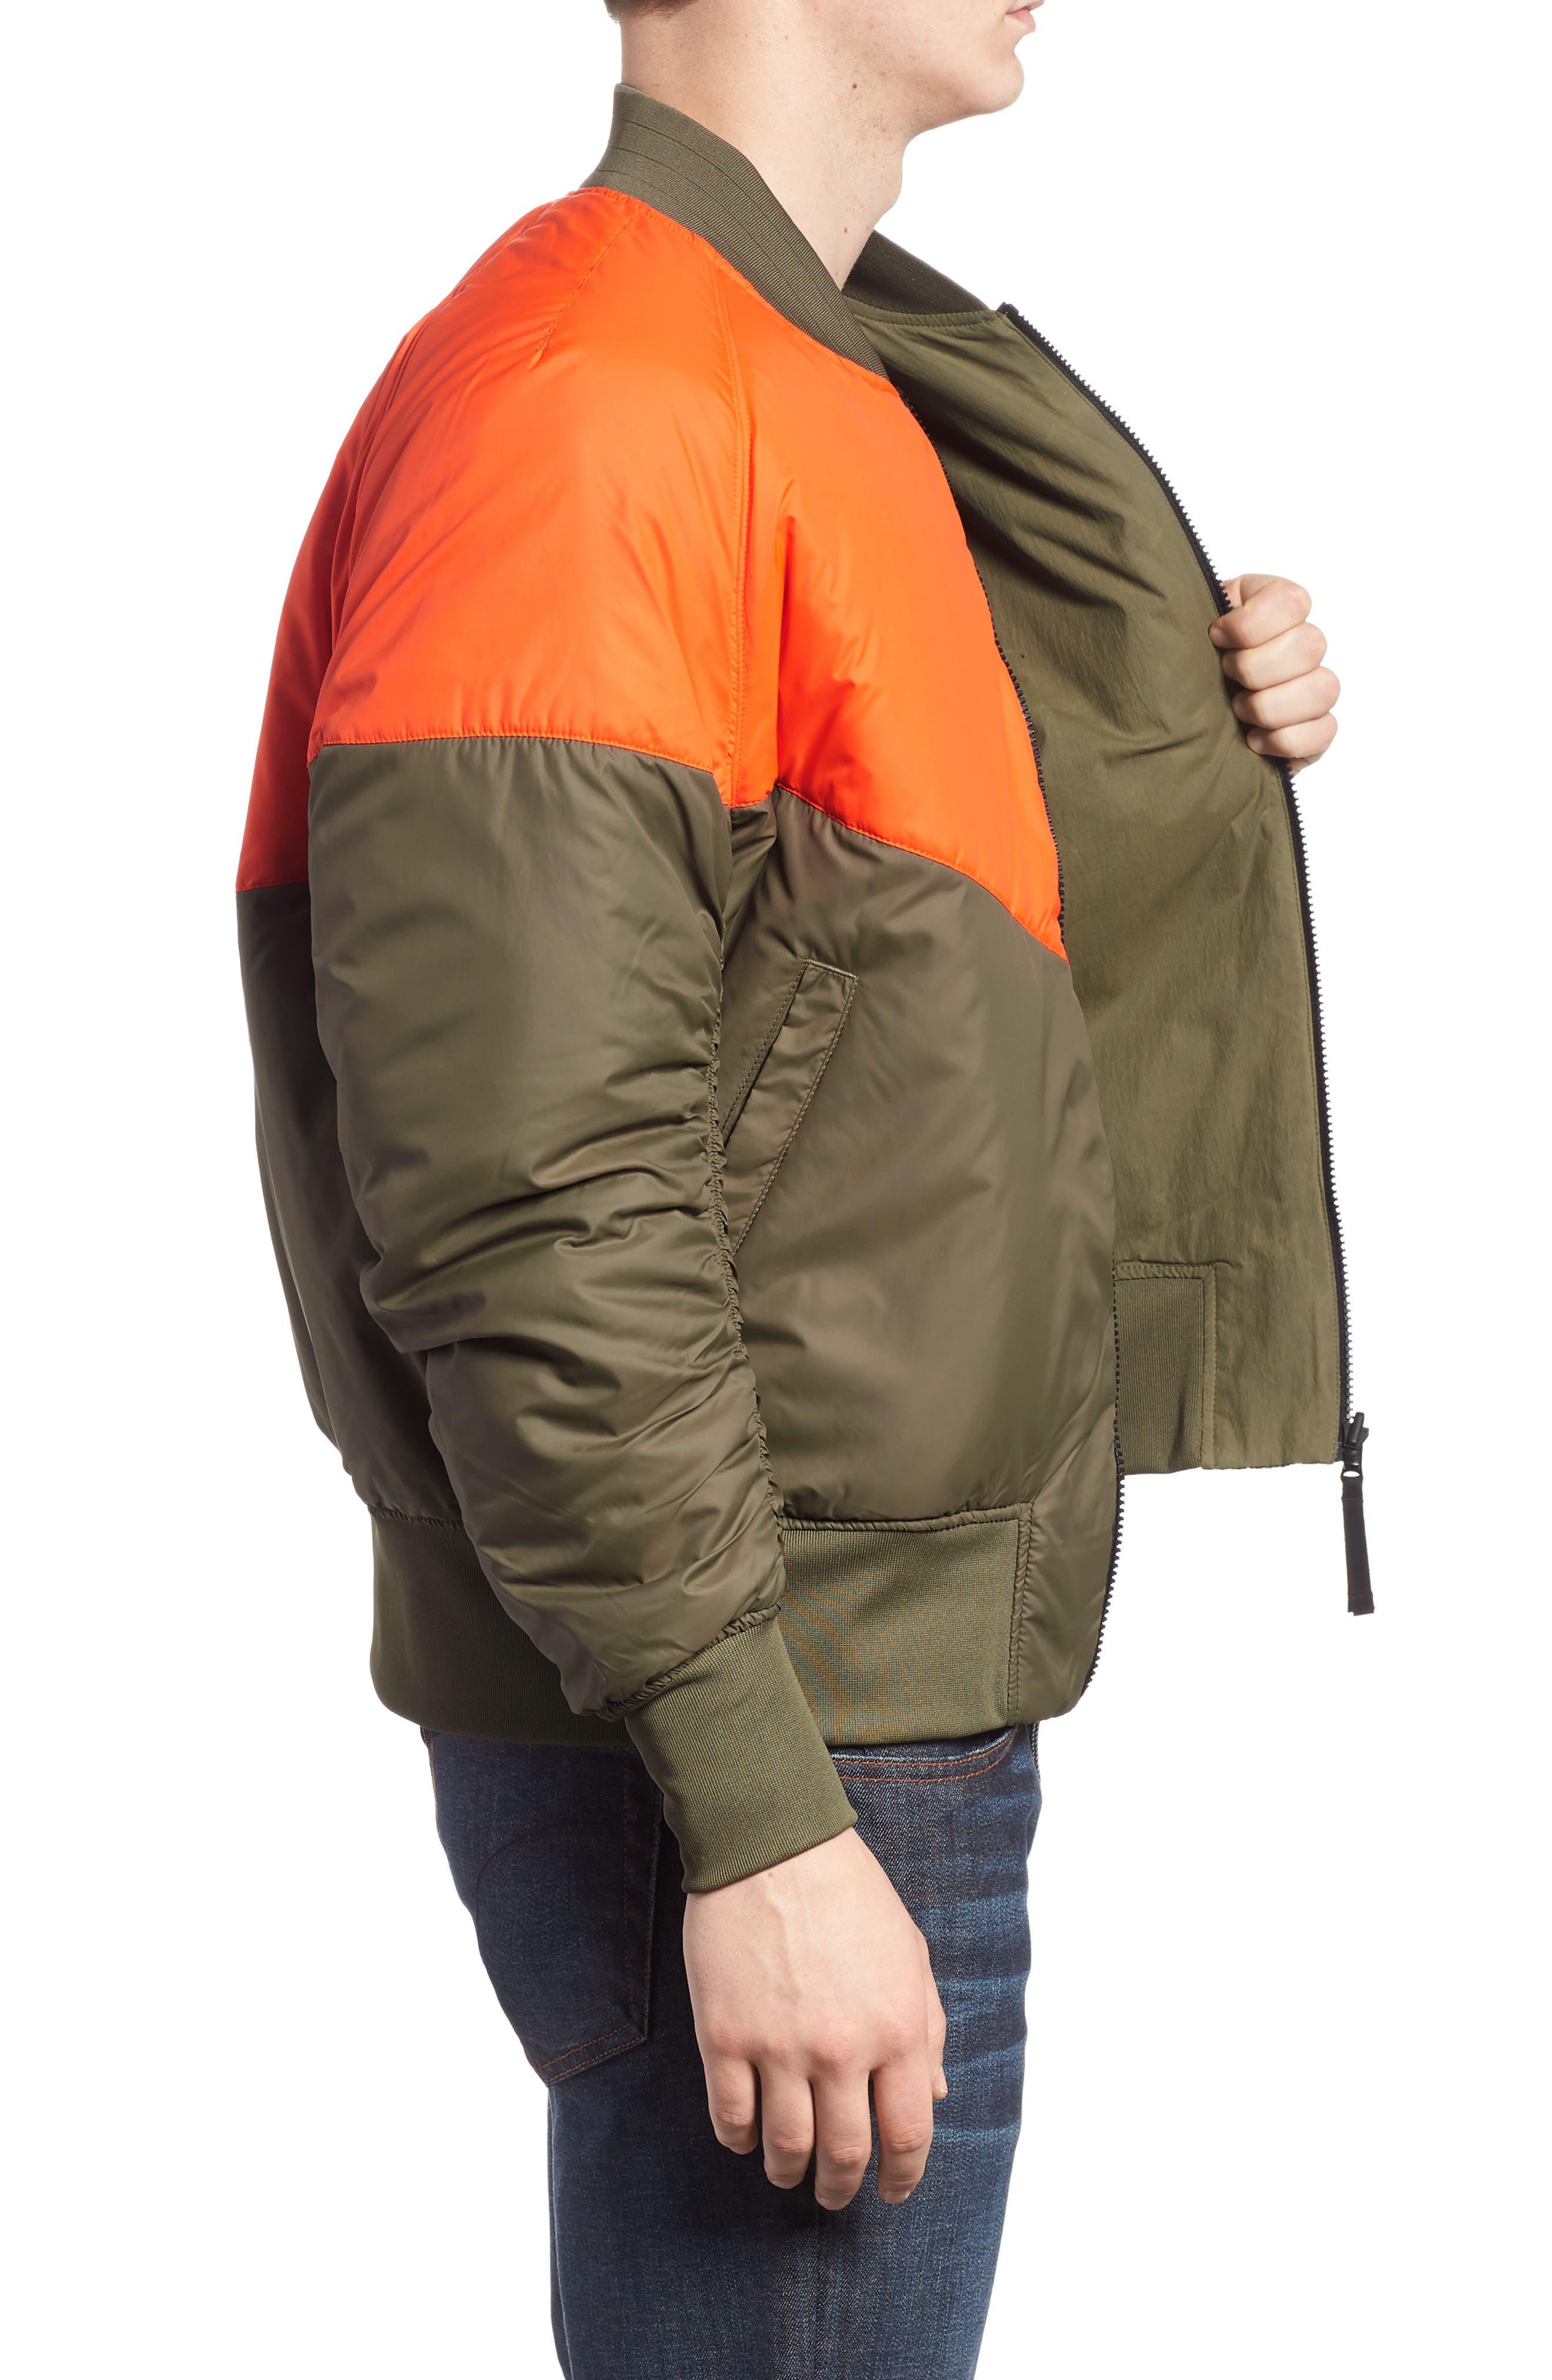 NSW Air Force 1 Jacket,                             Alternate thumbnail 3, color,                             Medium Olive/ Orange/ Olive